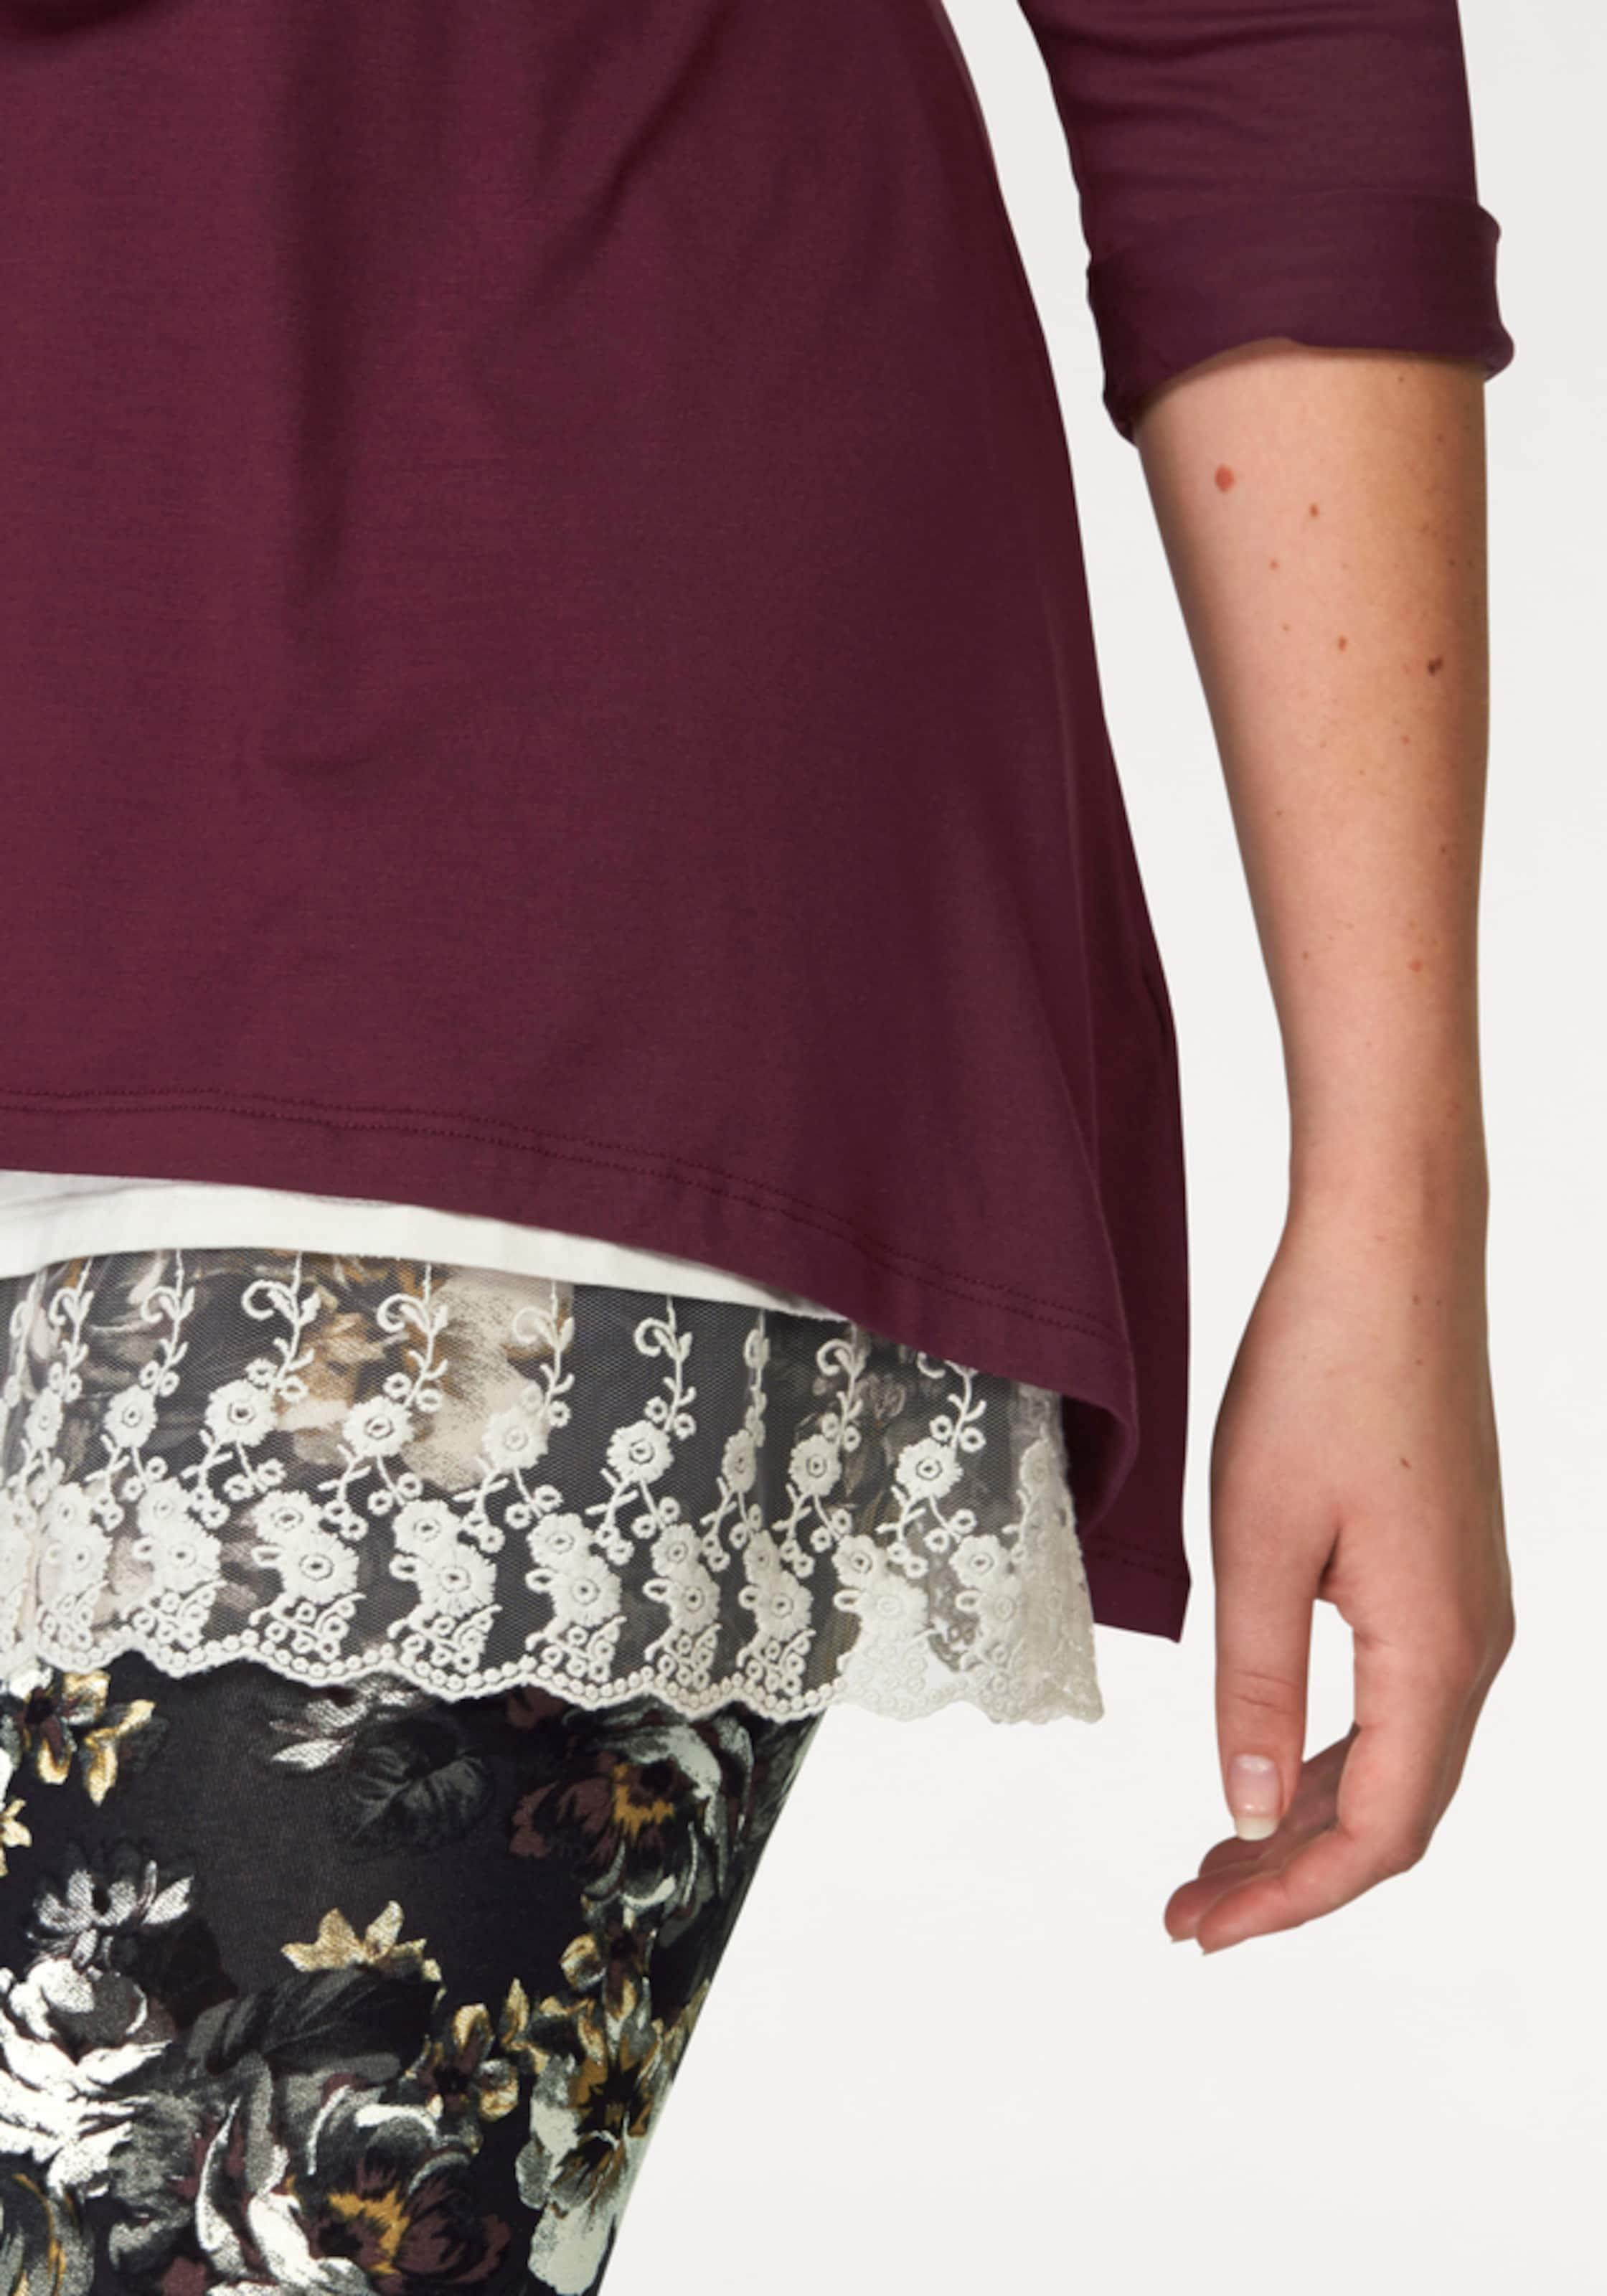 BOYSEN'S Longshirt Brandneue Unisex Günstig Online SUXyN